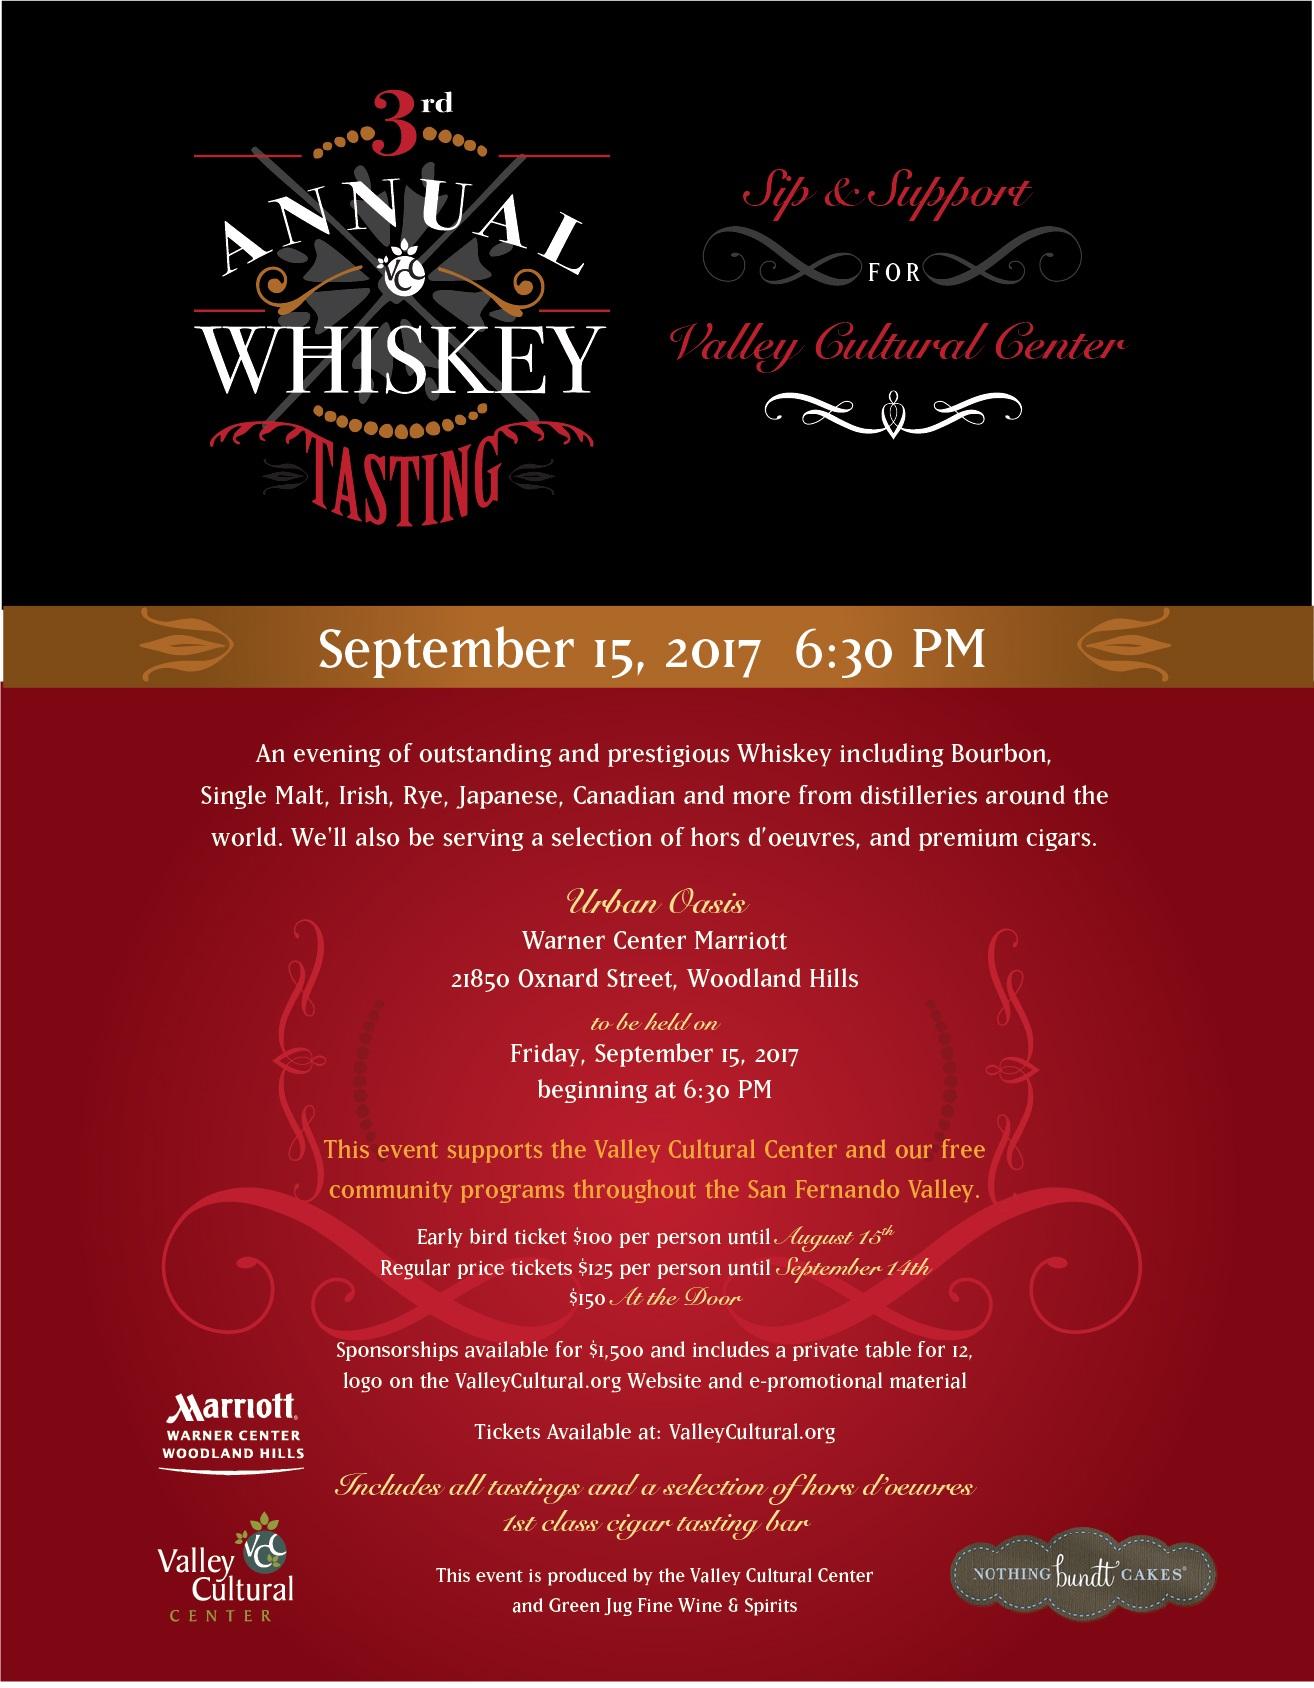 3rd Annual Whiskey Tasting Tickets Fri Sep 15 2017 at 630 PM